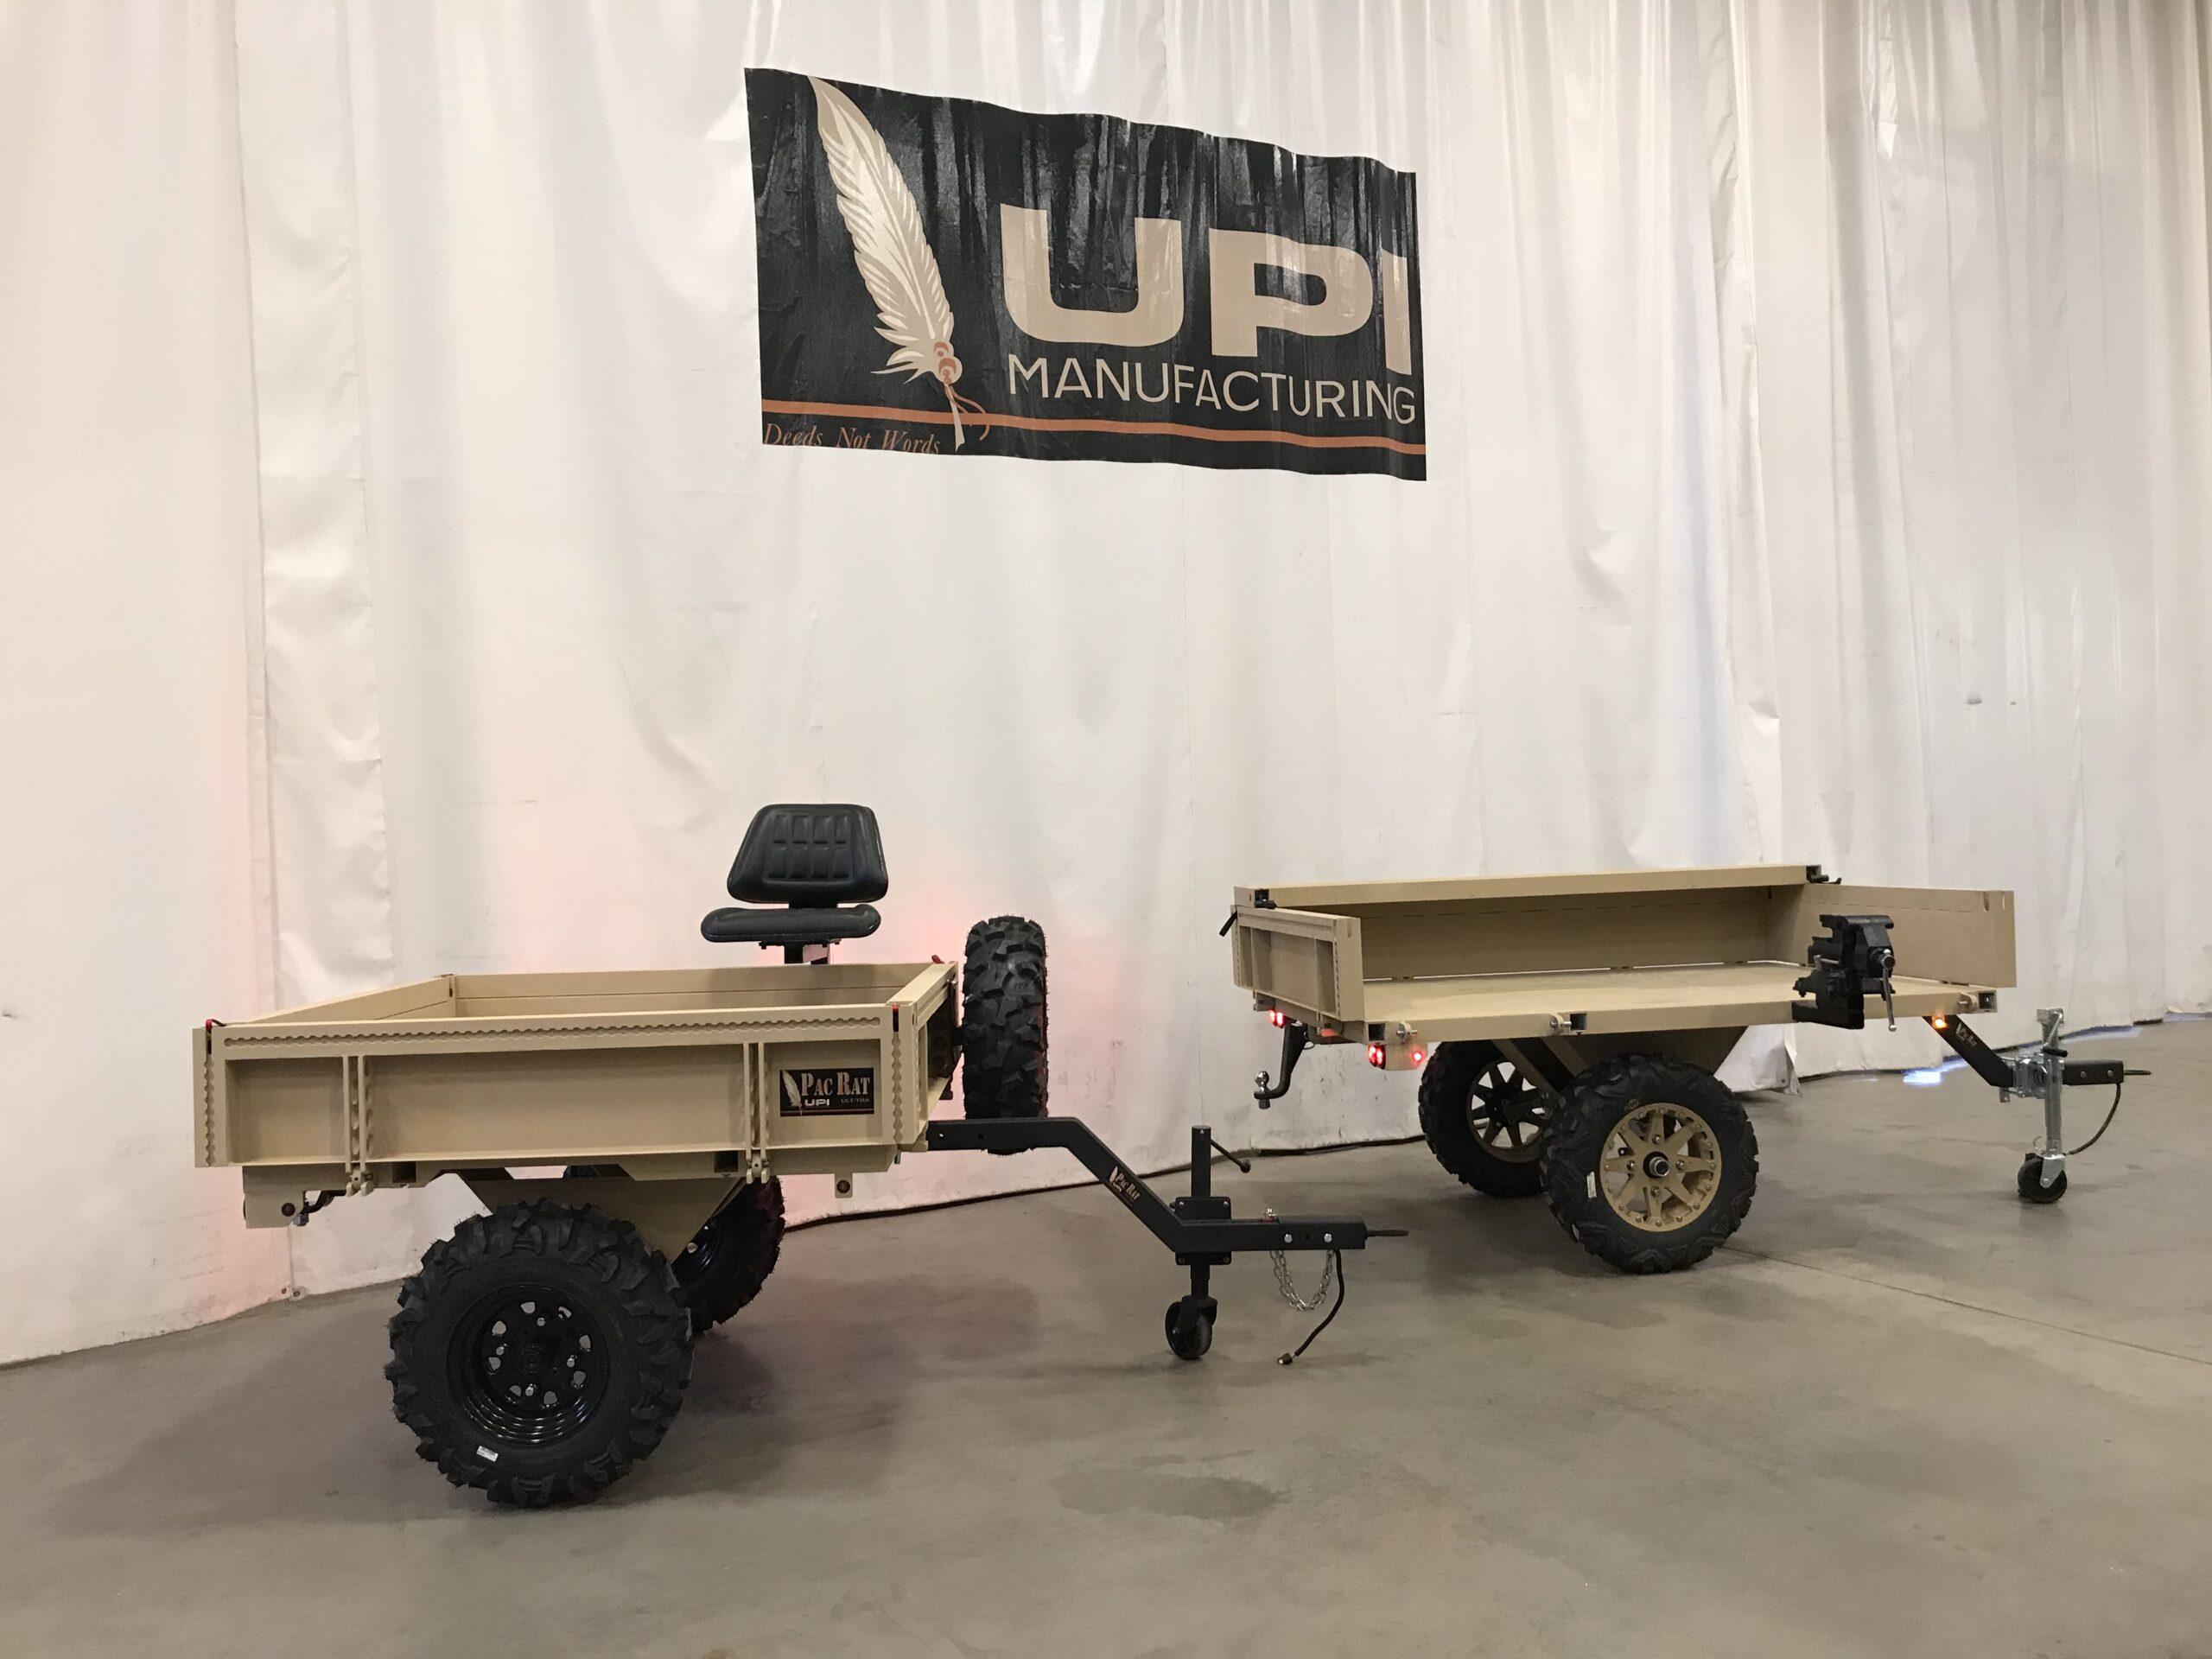 UPI Manufacturing